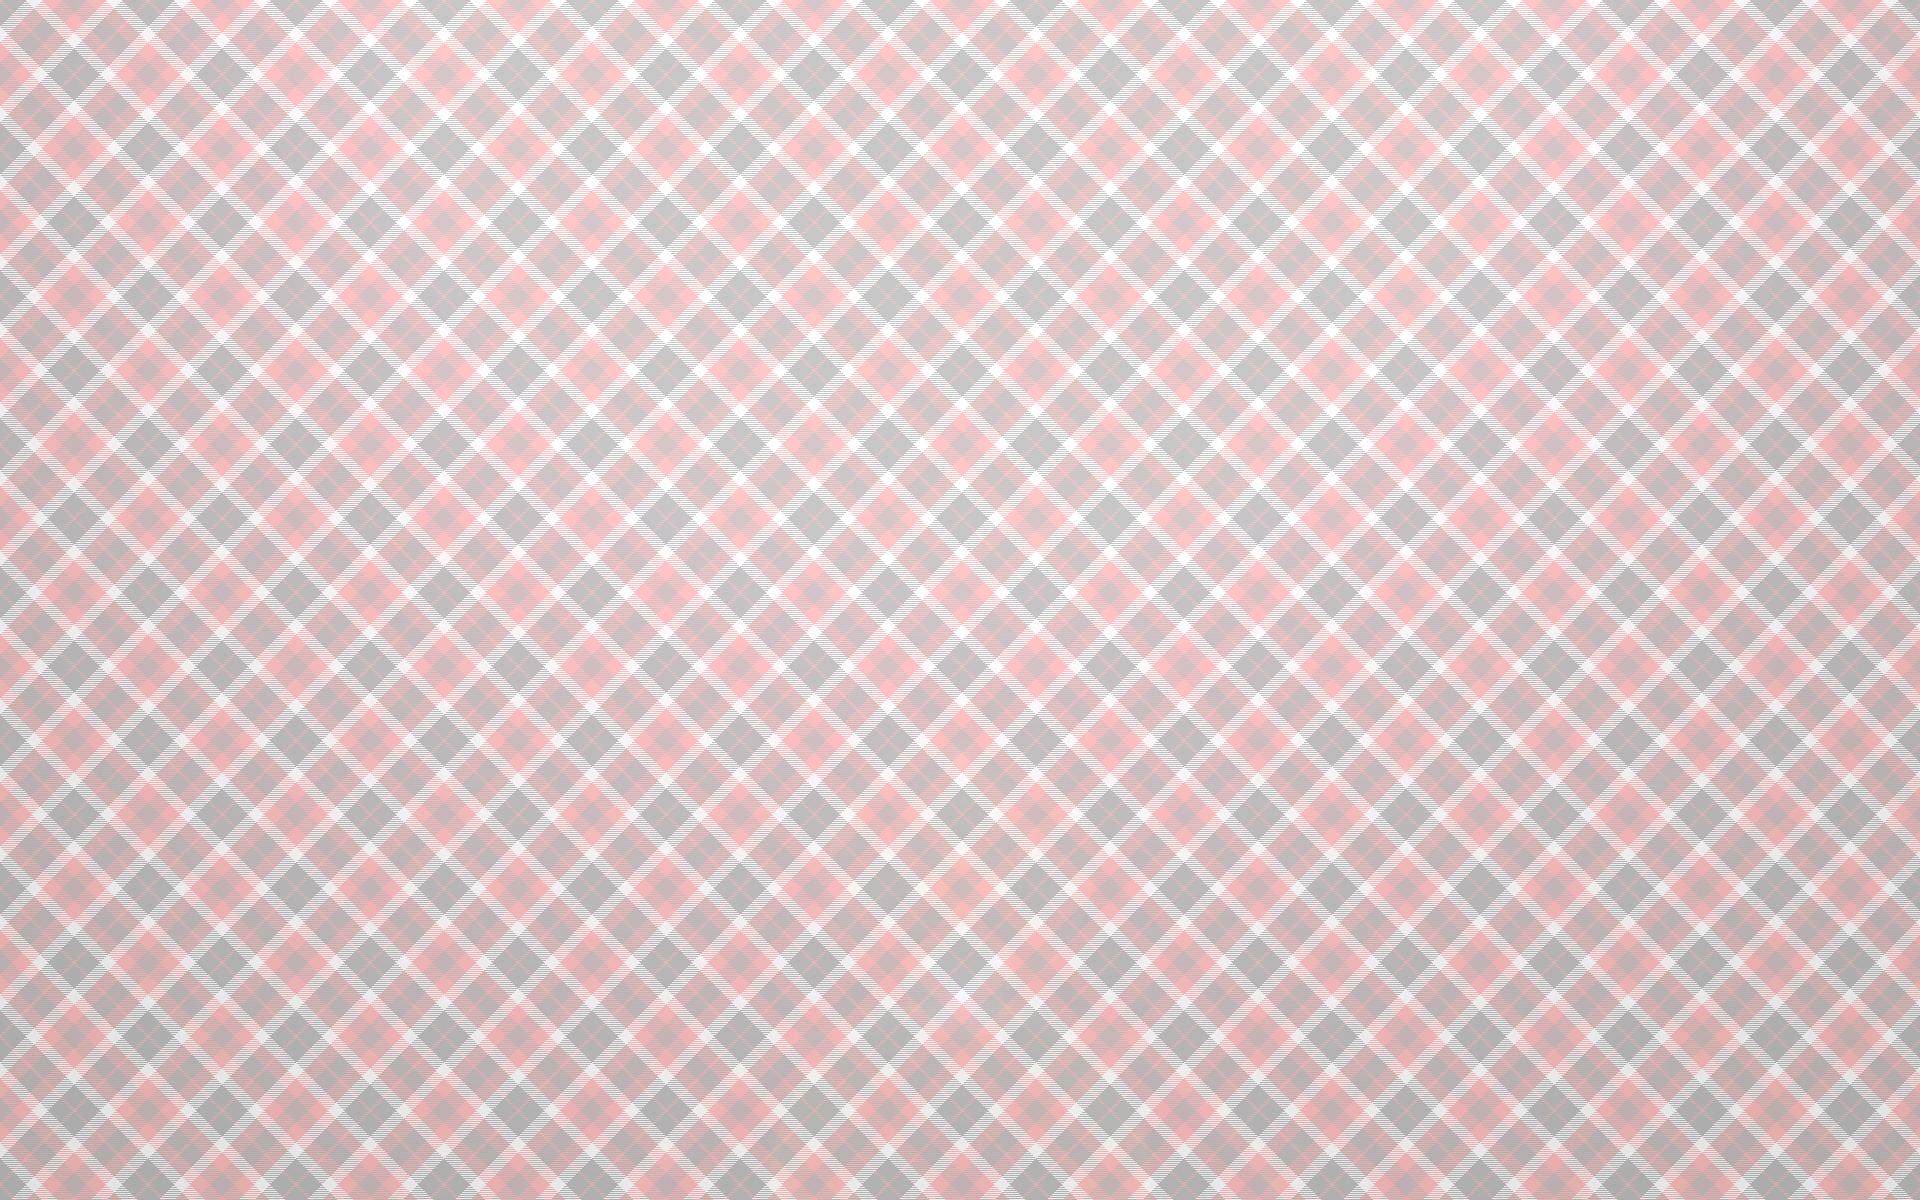 simple pattern wallpaper 45186 1920x1200 px